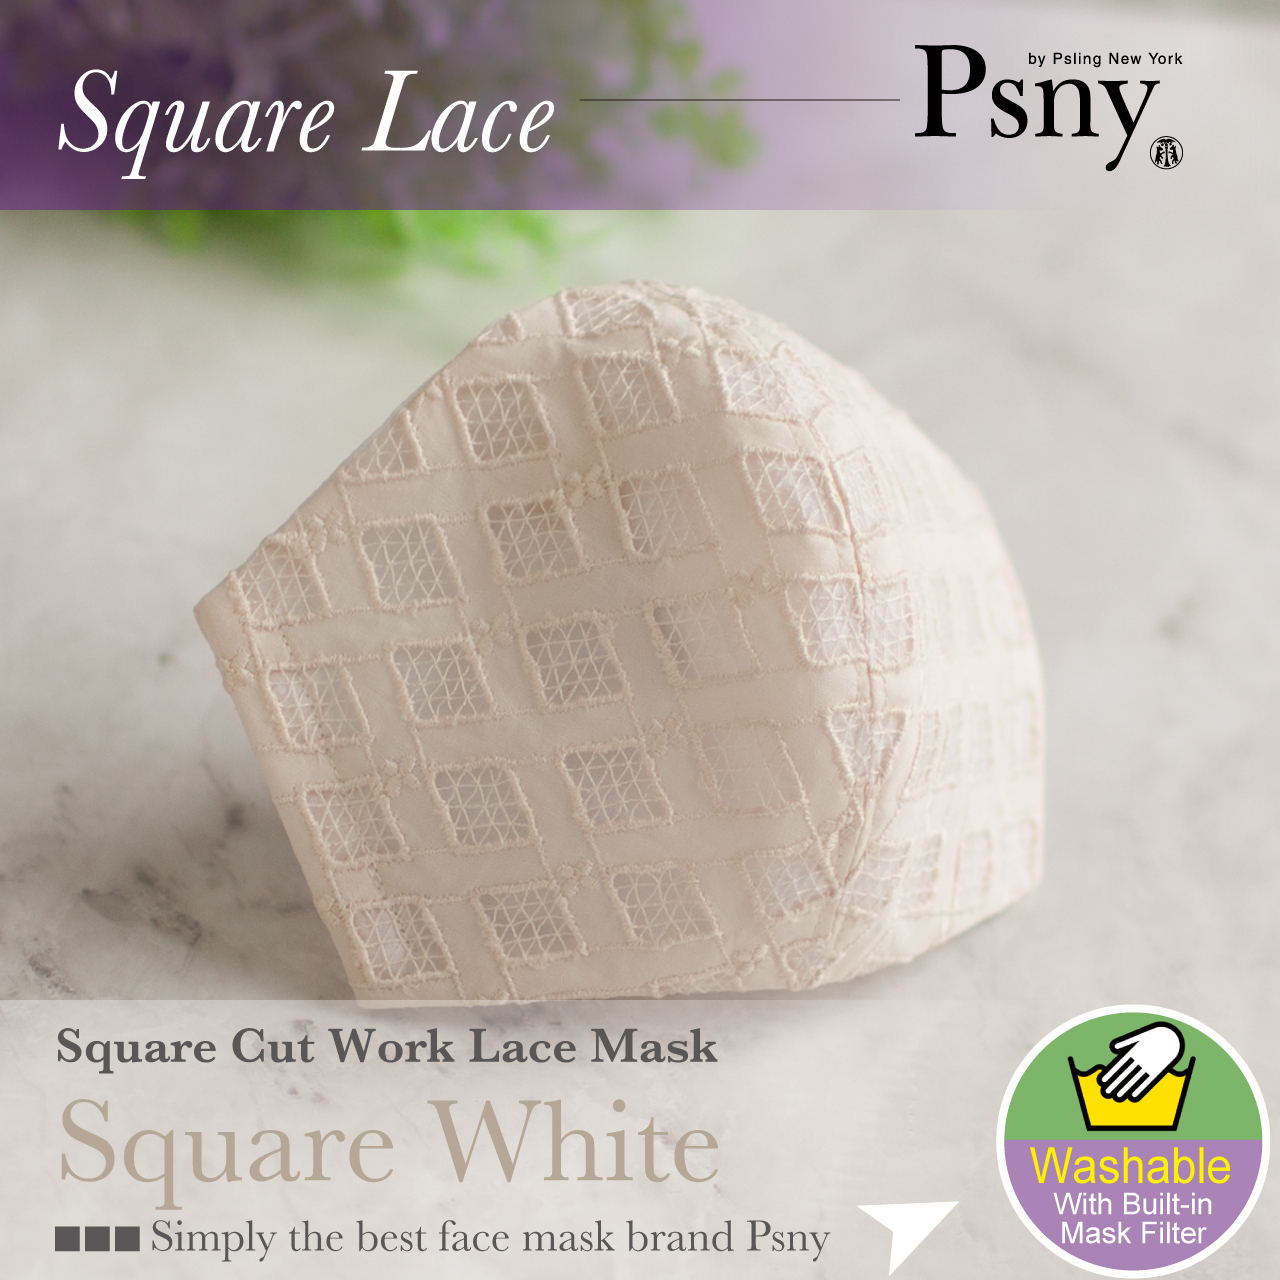 PSNY レース スクエア(ホワイト) 花粉 黄砂 洗える不織布フィルター入り 立体 大人用 マスク 送料無料 L70